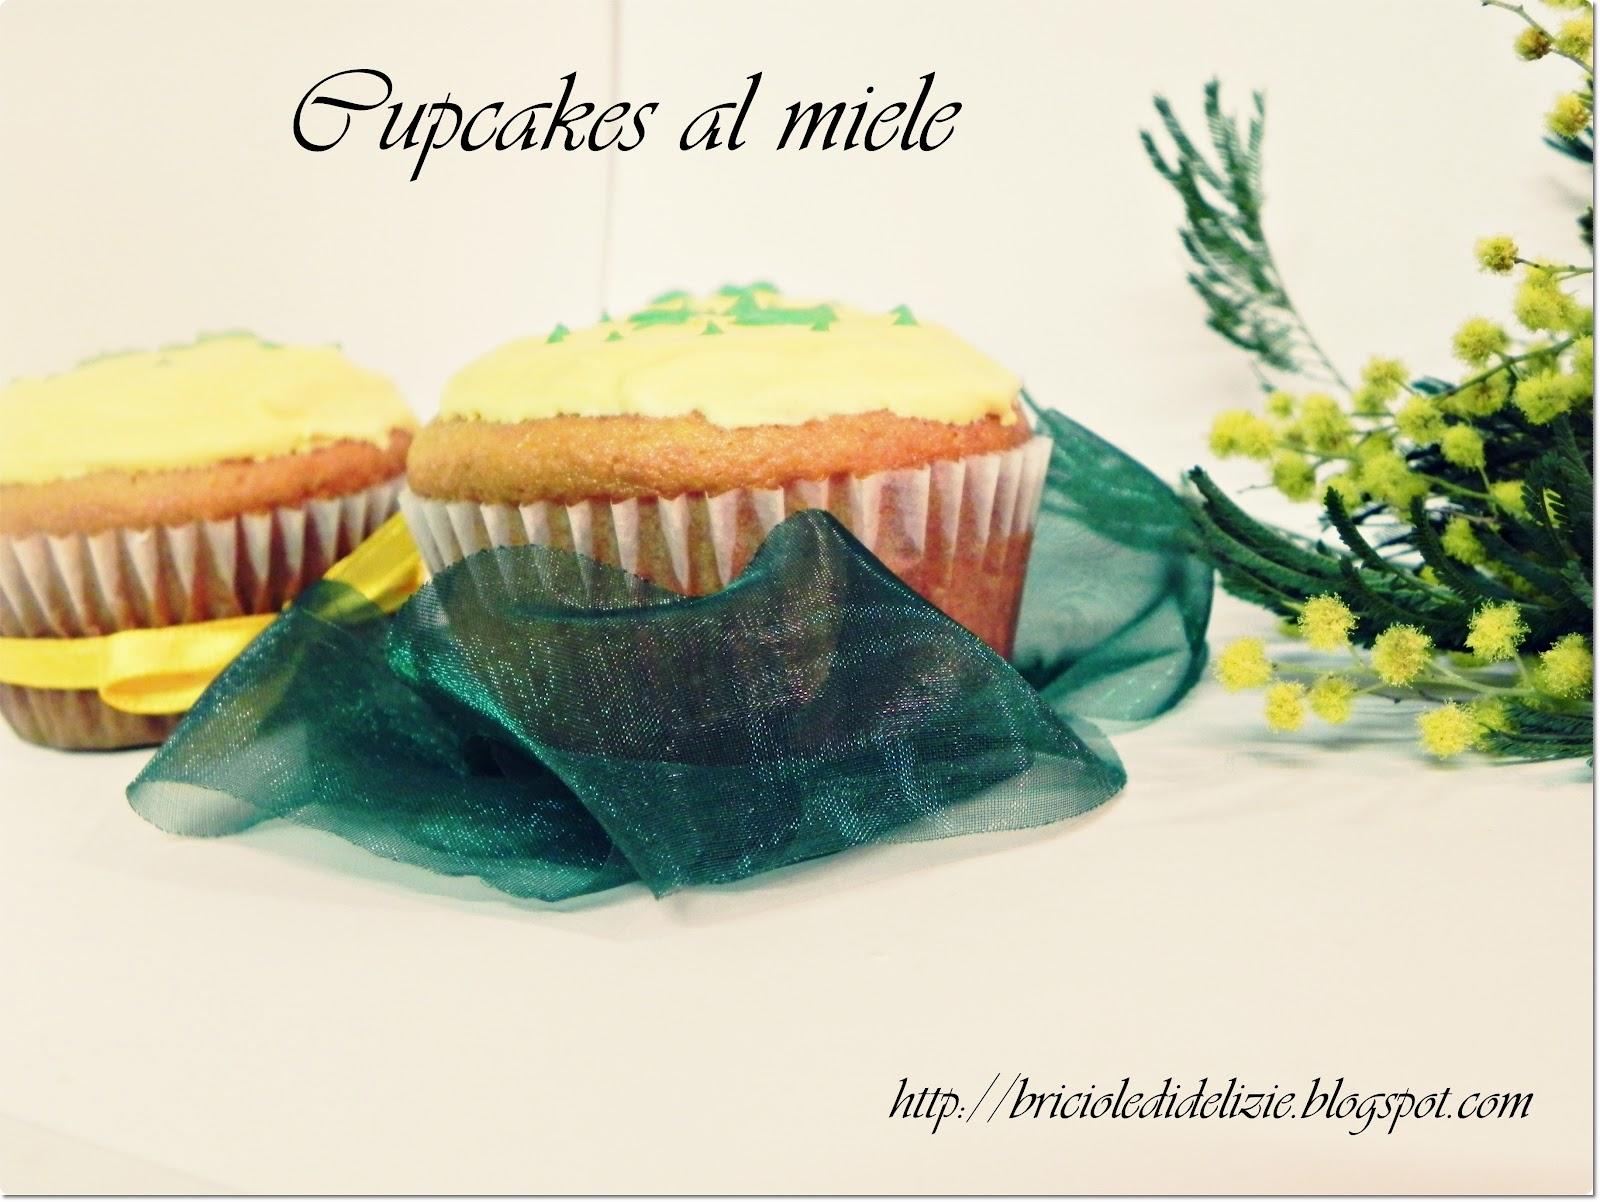 http://1.bp.blogspot.com/-iUBQ7nD5DvY/T1kcpGud2-I/AAAAAAAAA4o/I-wI00joN6c/s1600/Cupcakes+festa+donna3.JPG